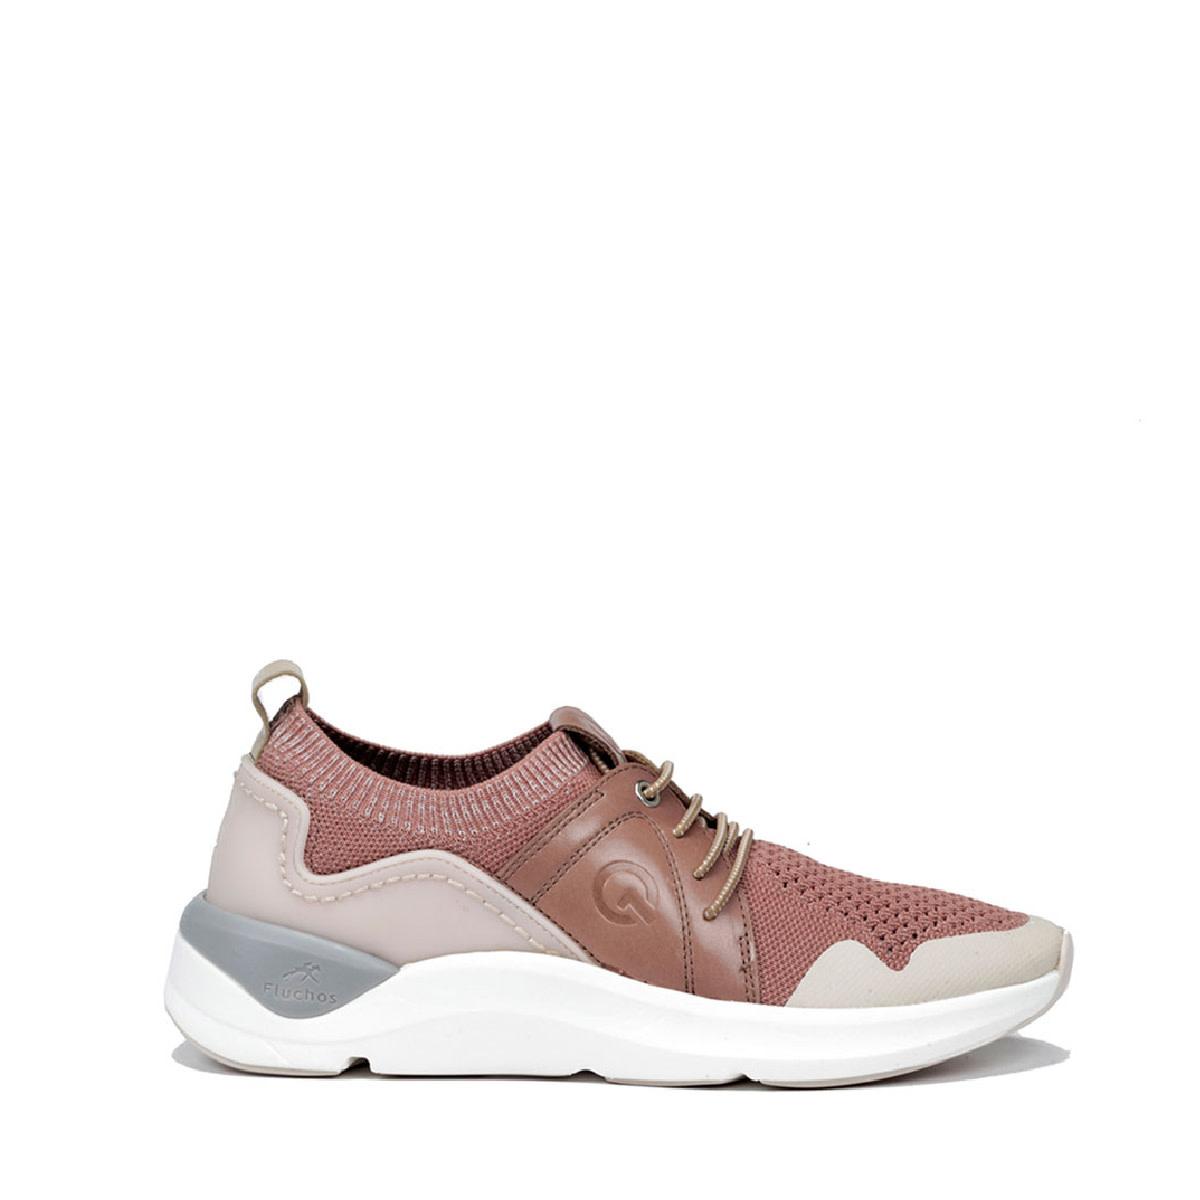 Atom One Atom One F0879 Sneaker Pink